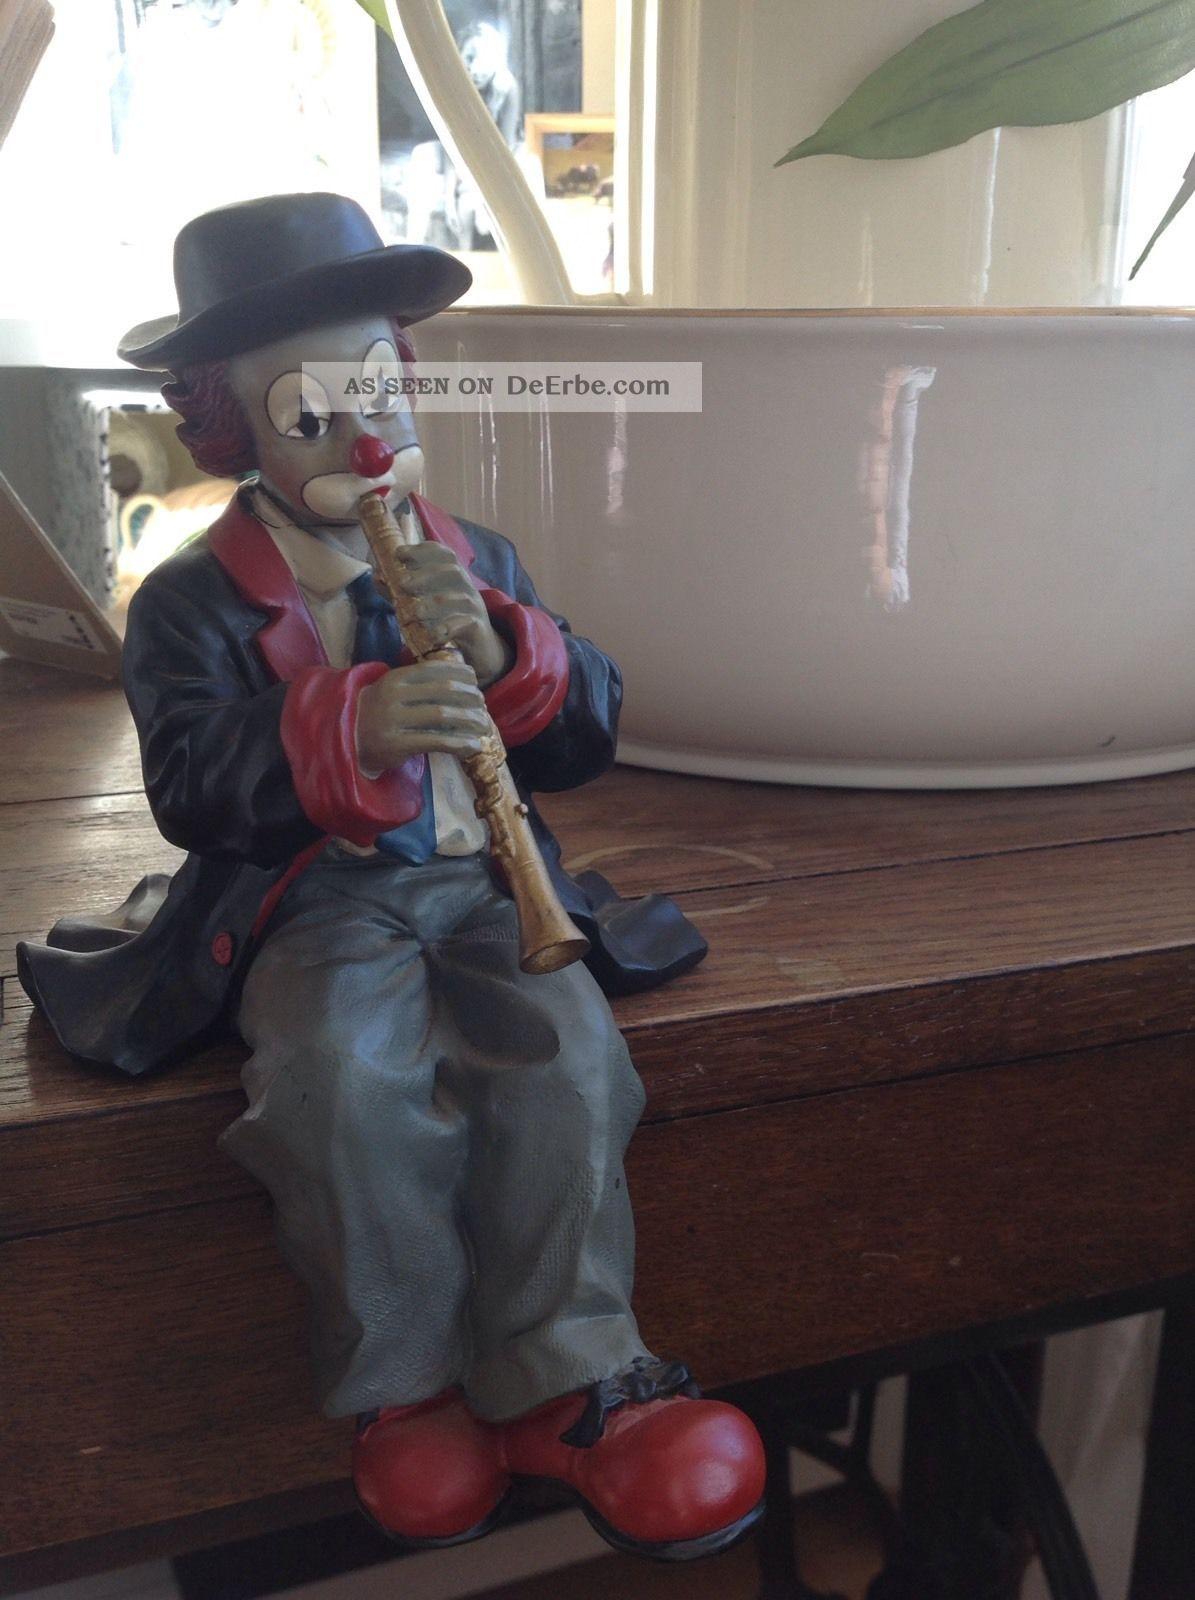 Gilde - Gildeclown Regalsitzer Klarinette/oboe Ab 2000 Bild